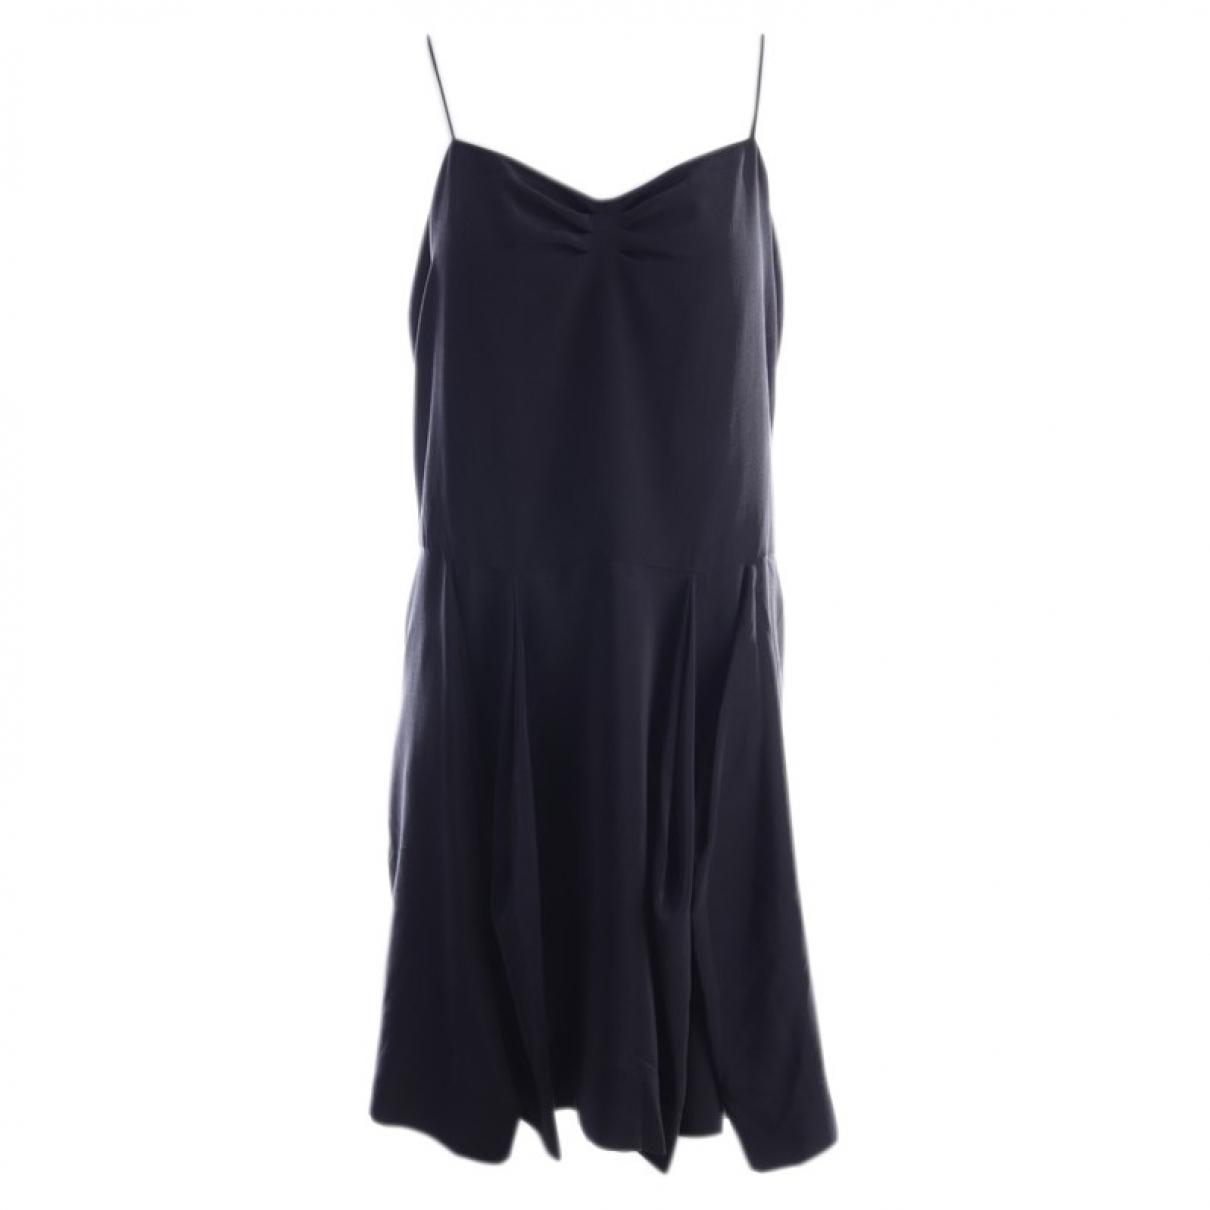 Stella Mccartney N Black Silk dress for Women 36 FR